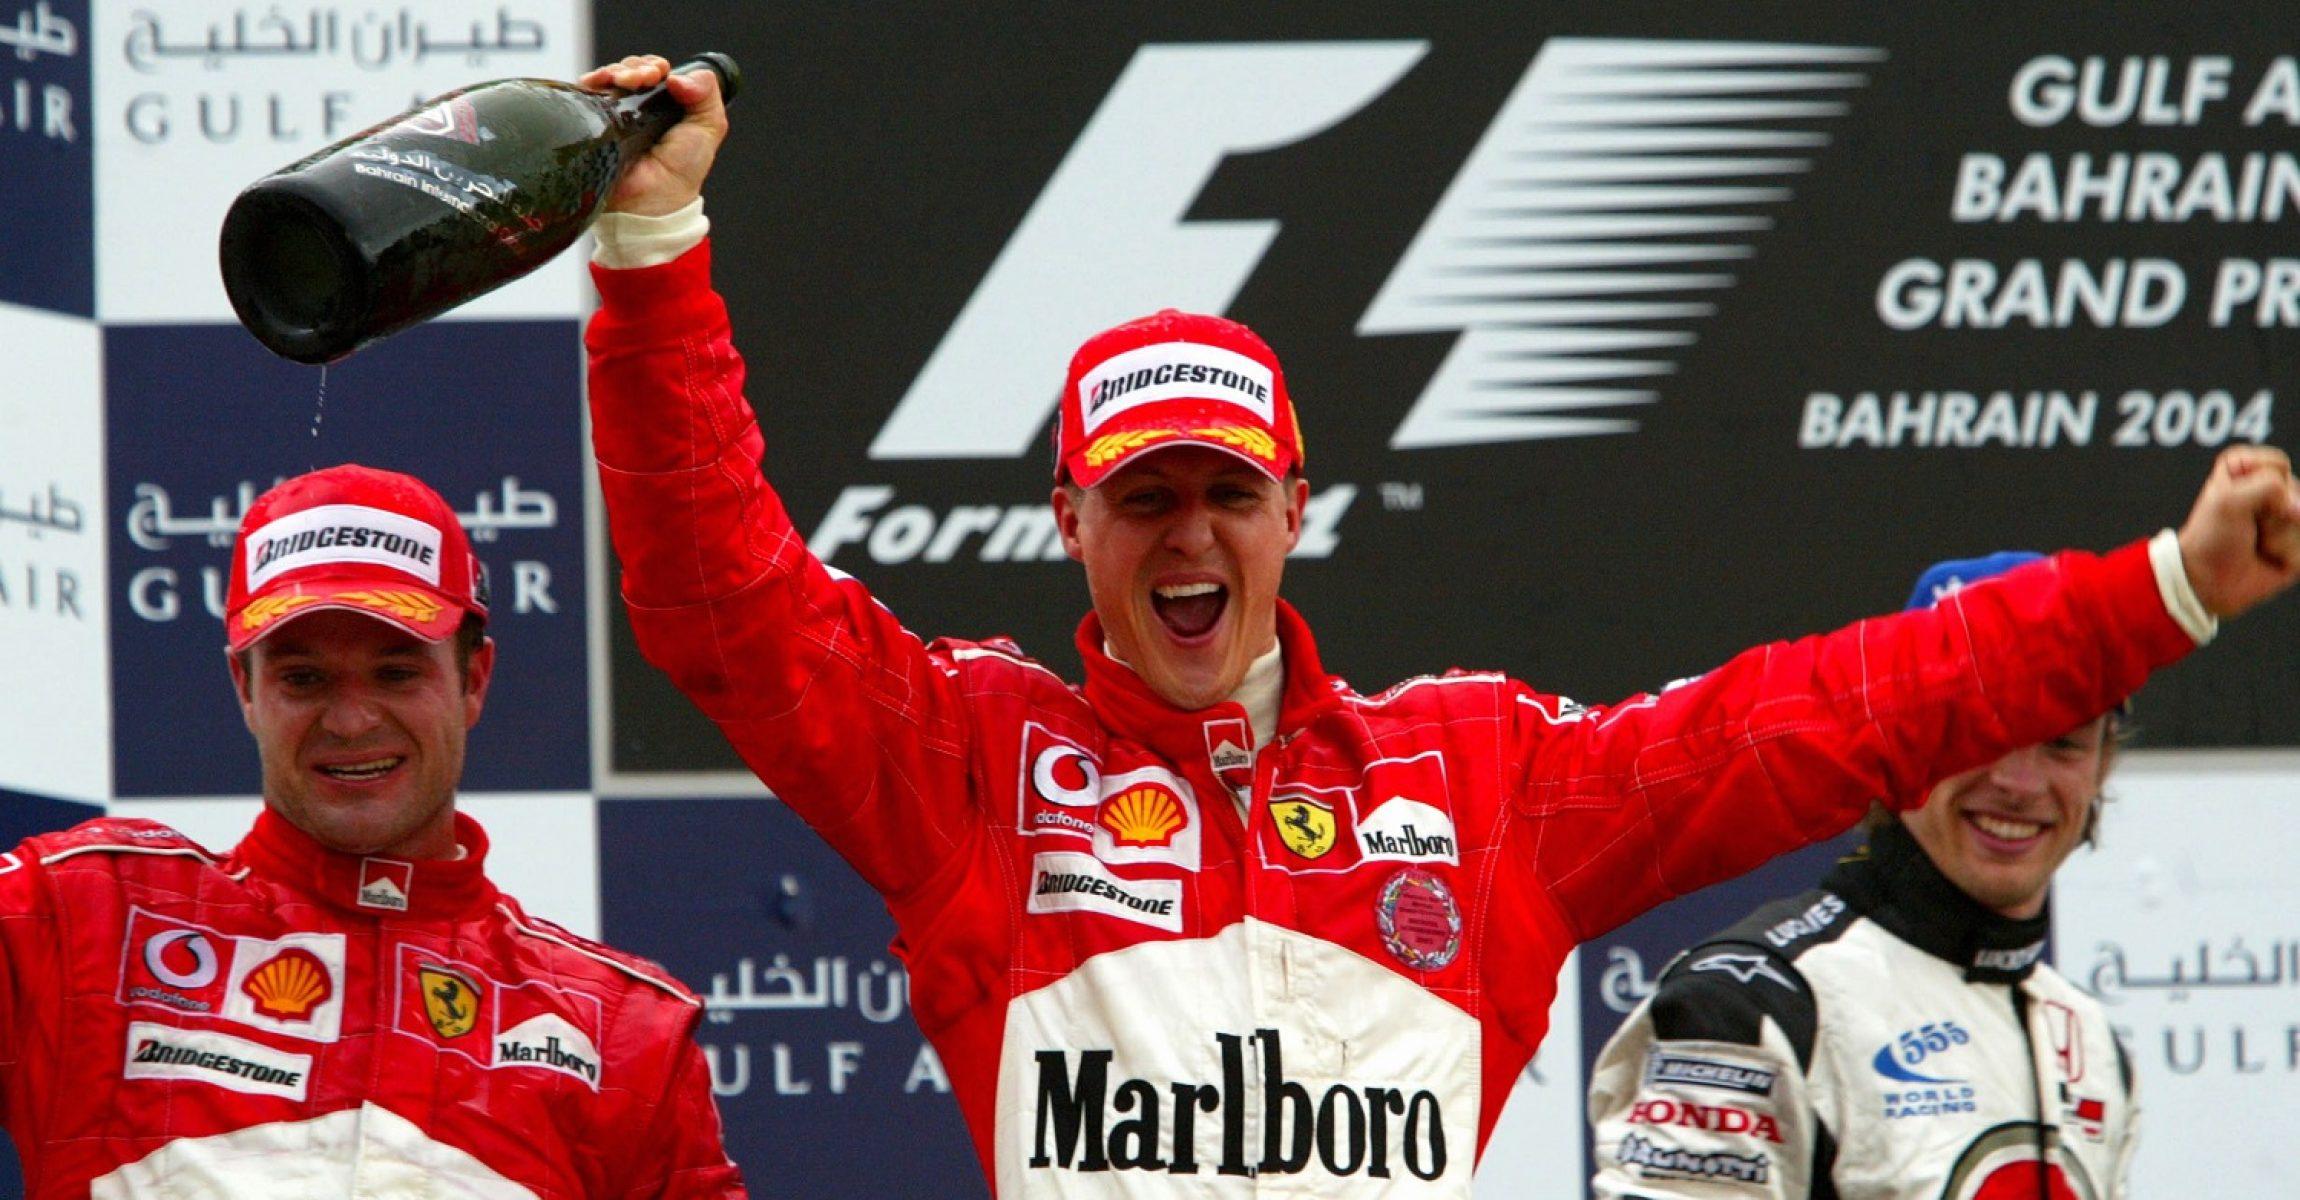 Race winner Michael Schumacher (GER) Ferrari on the podium. Formula One World Championship, Rd3, Bahrain Grand Prix, Race Day, Bahrain International Circuit, Bahrain, 4 April 2004. DIGITAL IMAGE BEST IMAGE